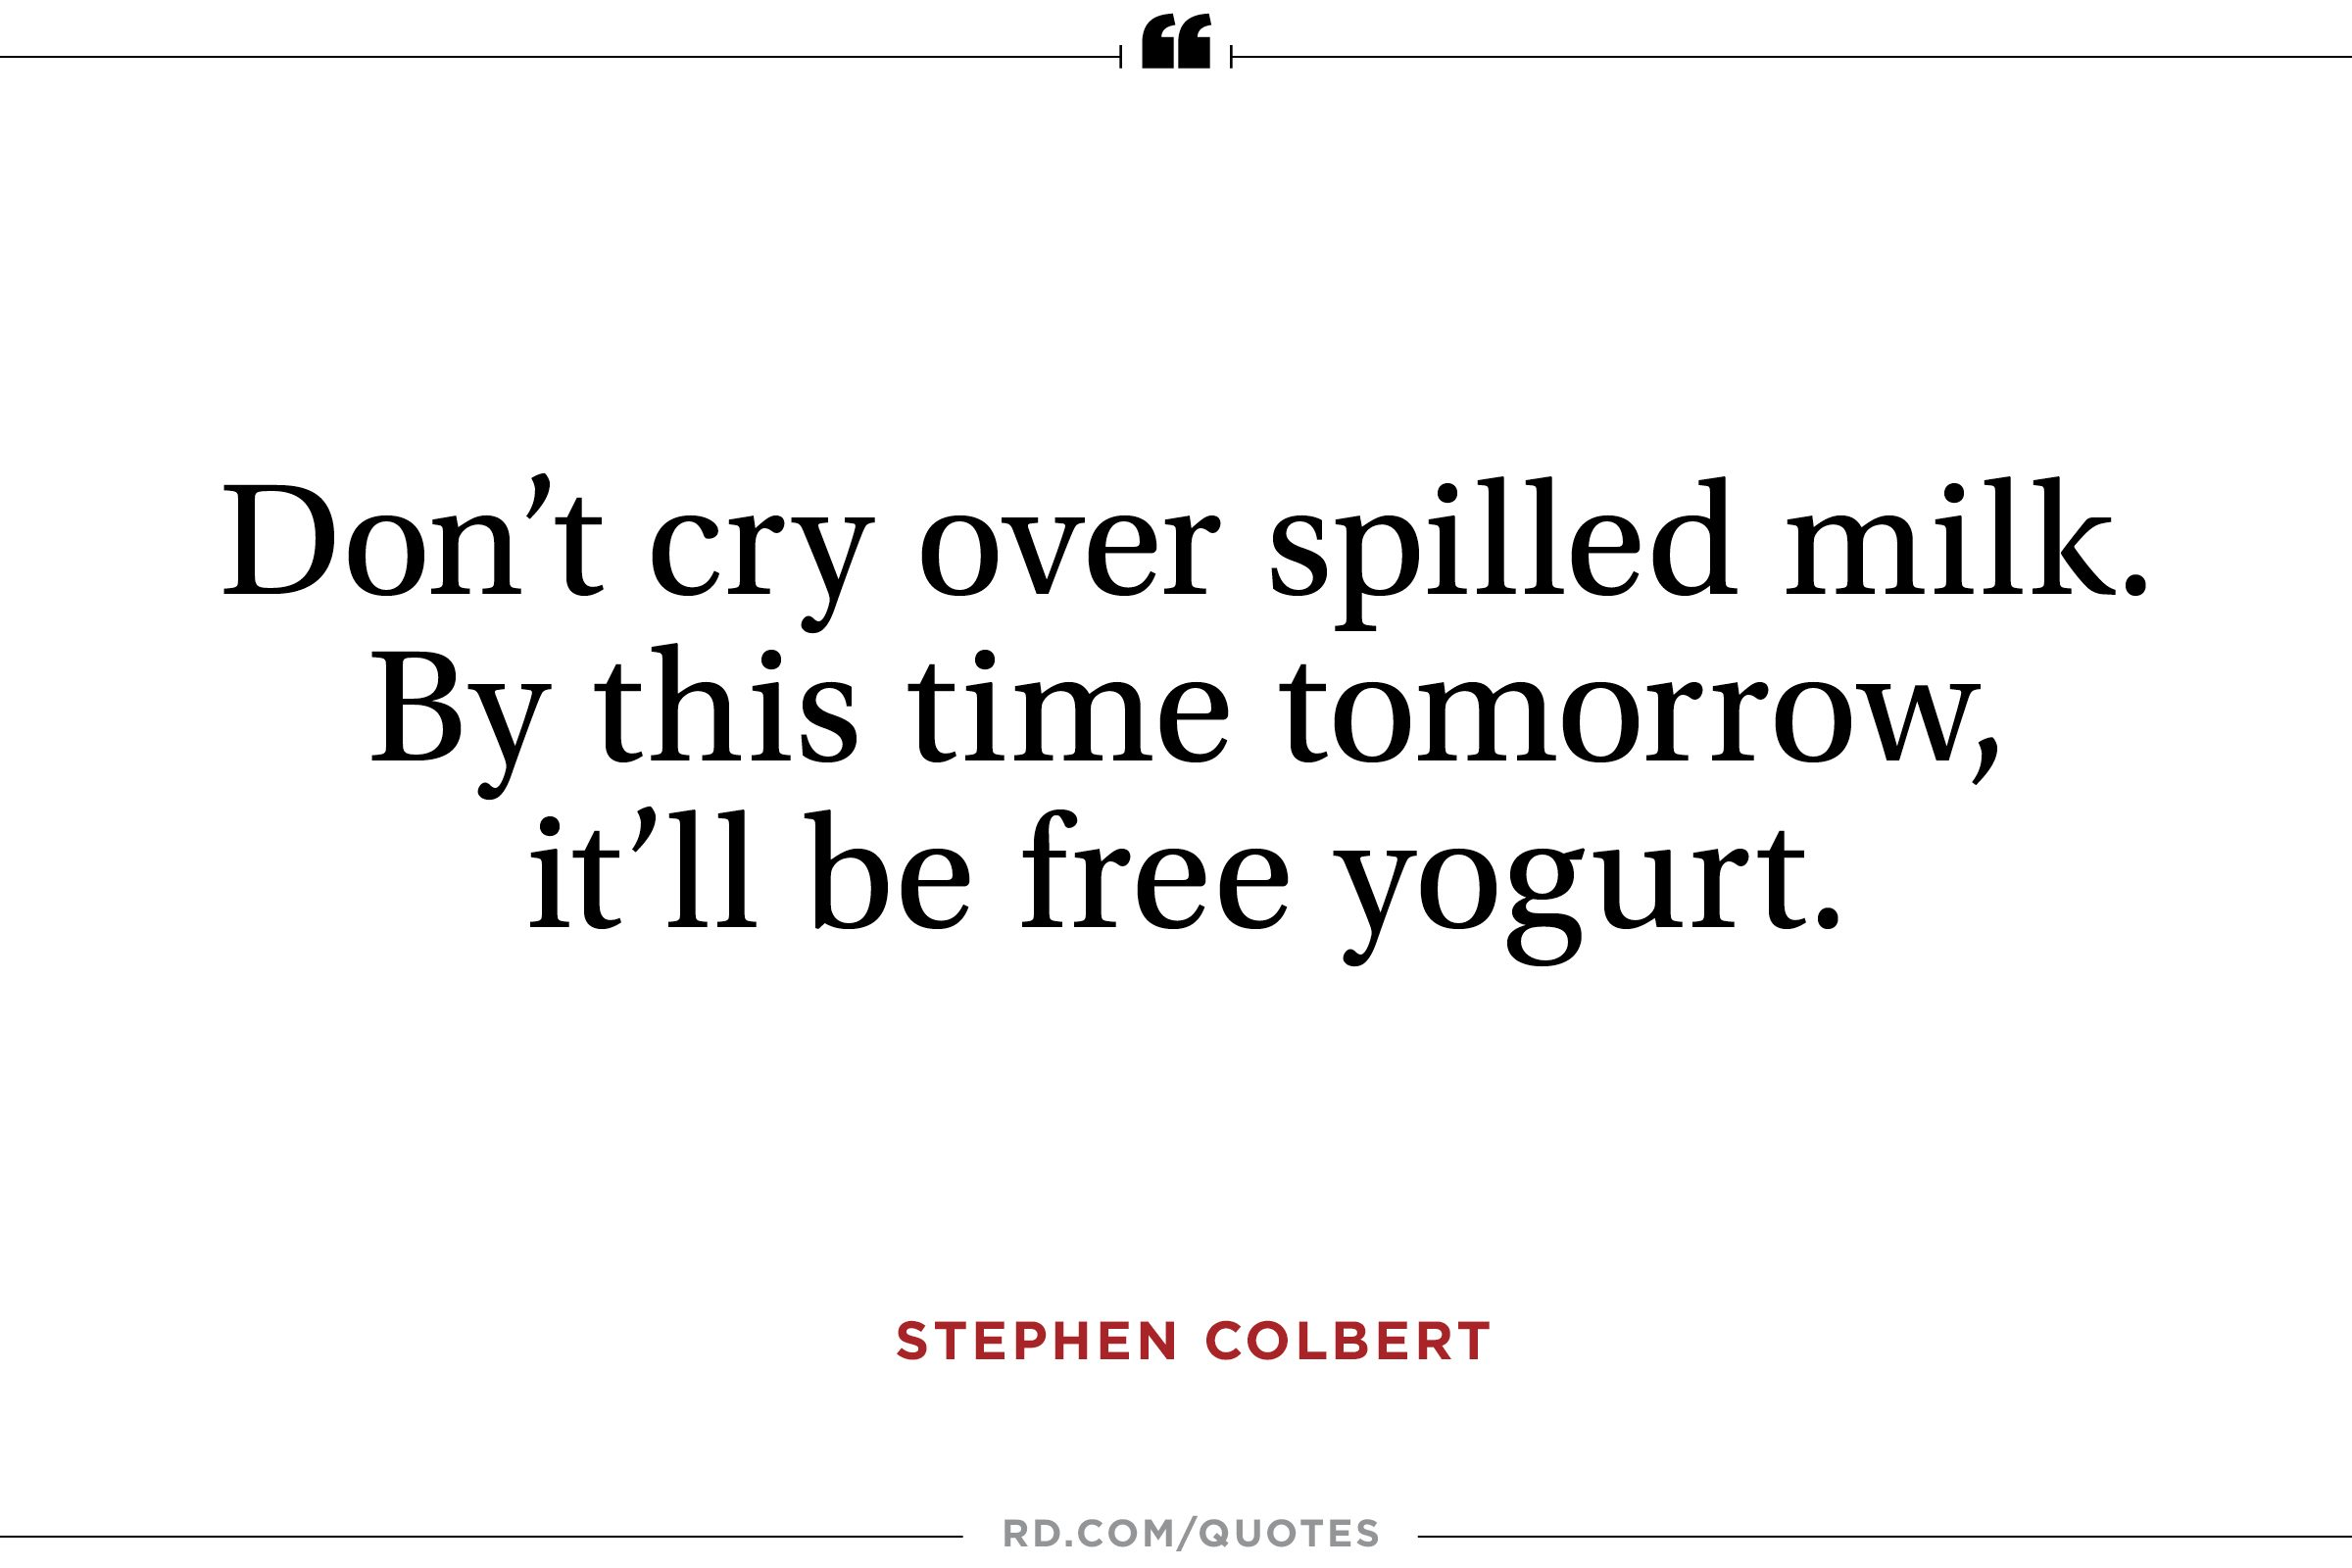 14 Best Ever Stephen Colbert Quotes